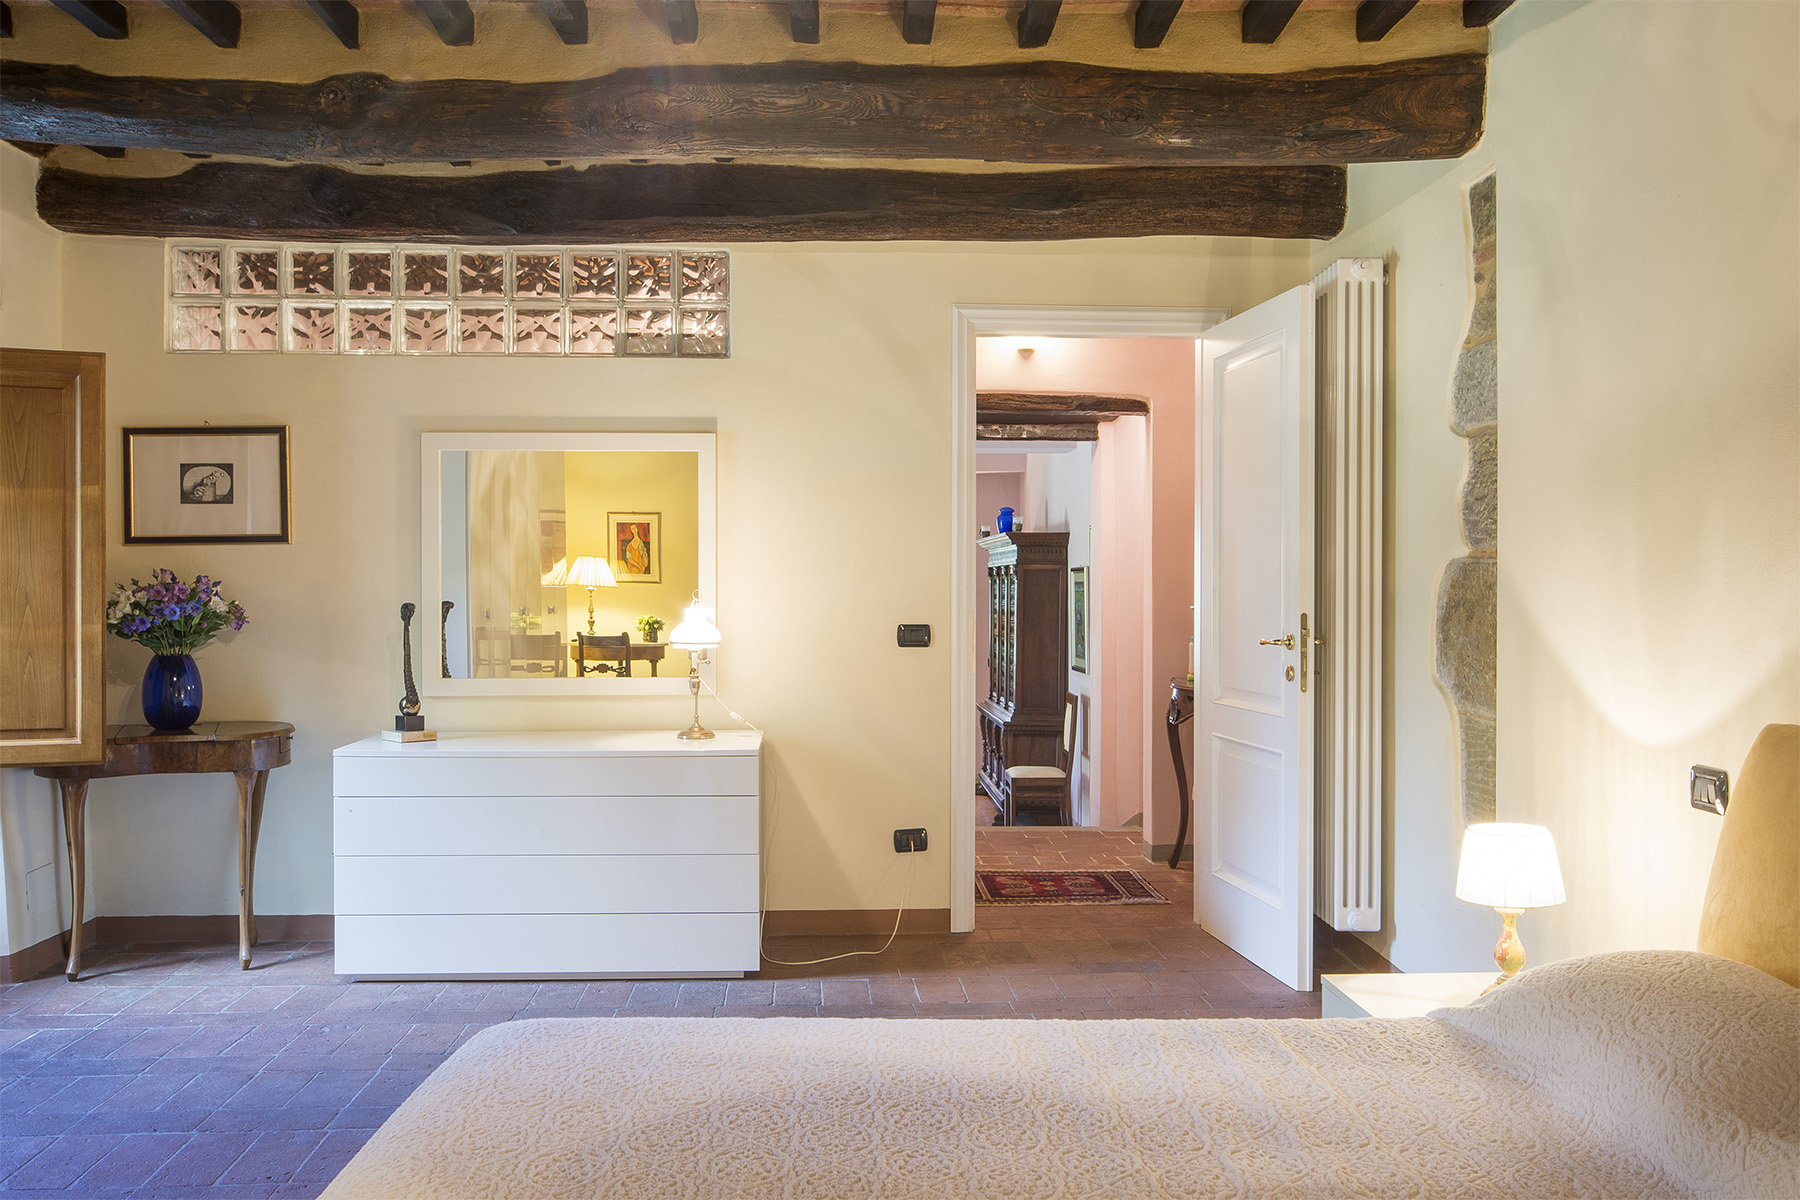 Villa in Vendita a Lucca: 5 locali, 1150 mq - Foto 18